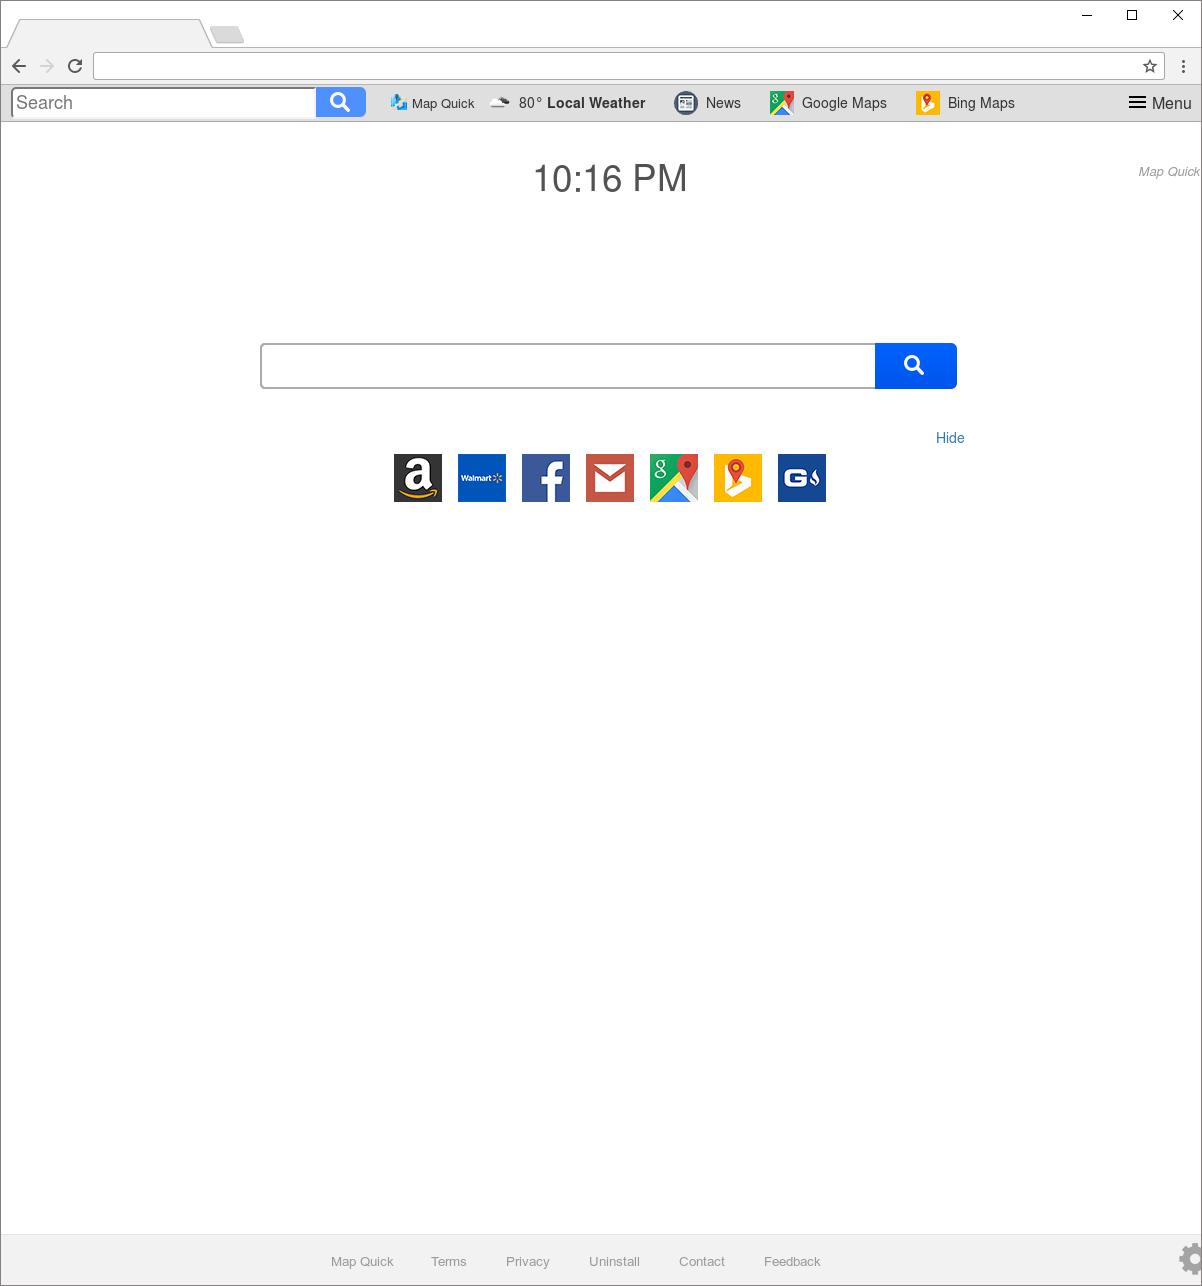 Search.searchjsmmp.com Hijacker